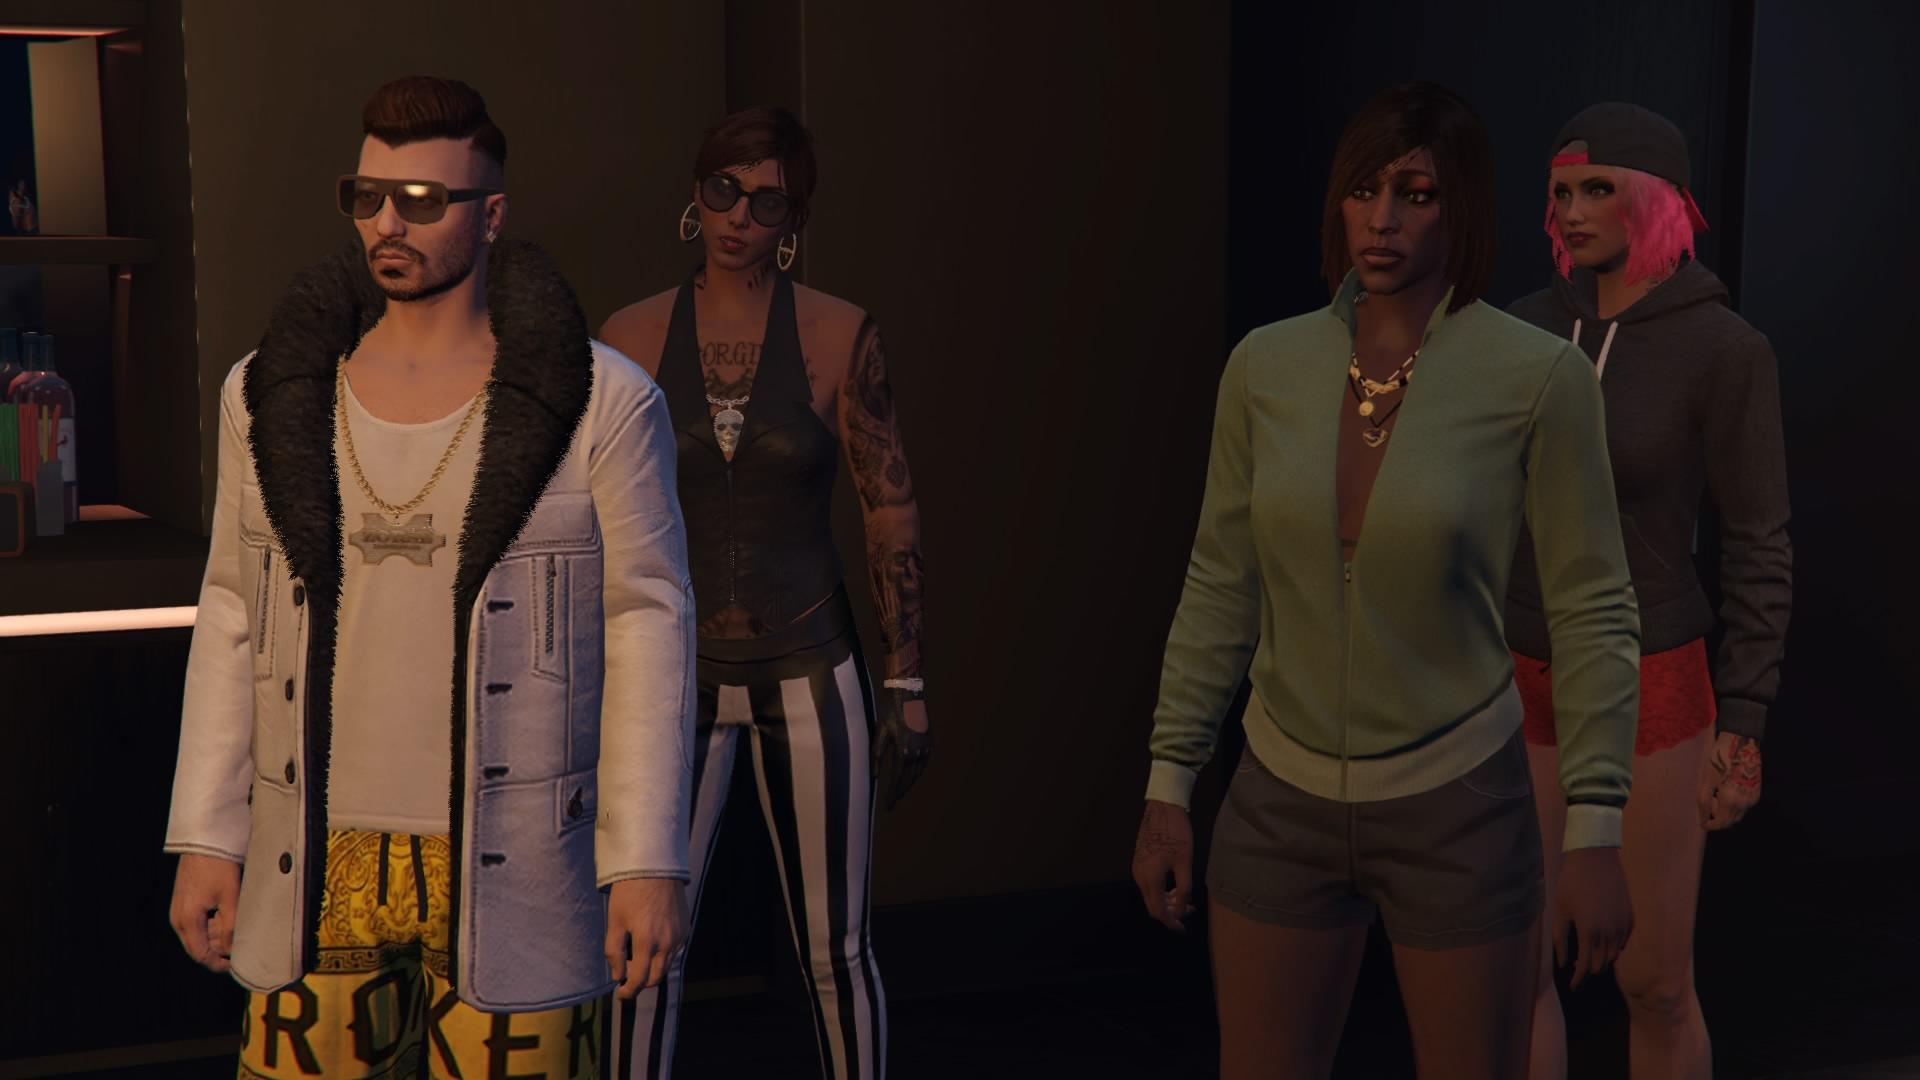 Grand-Theft-Auto-V-20190807185233.jpg